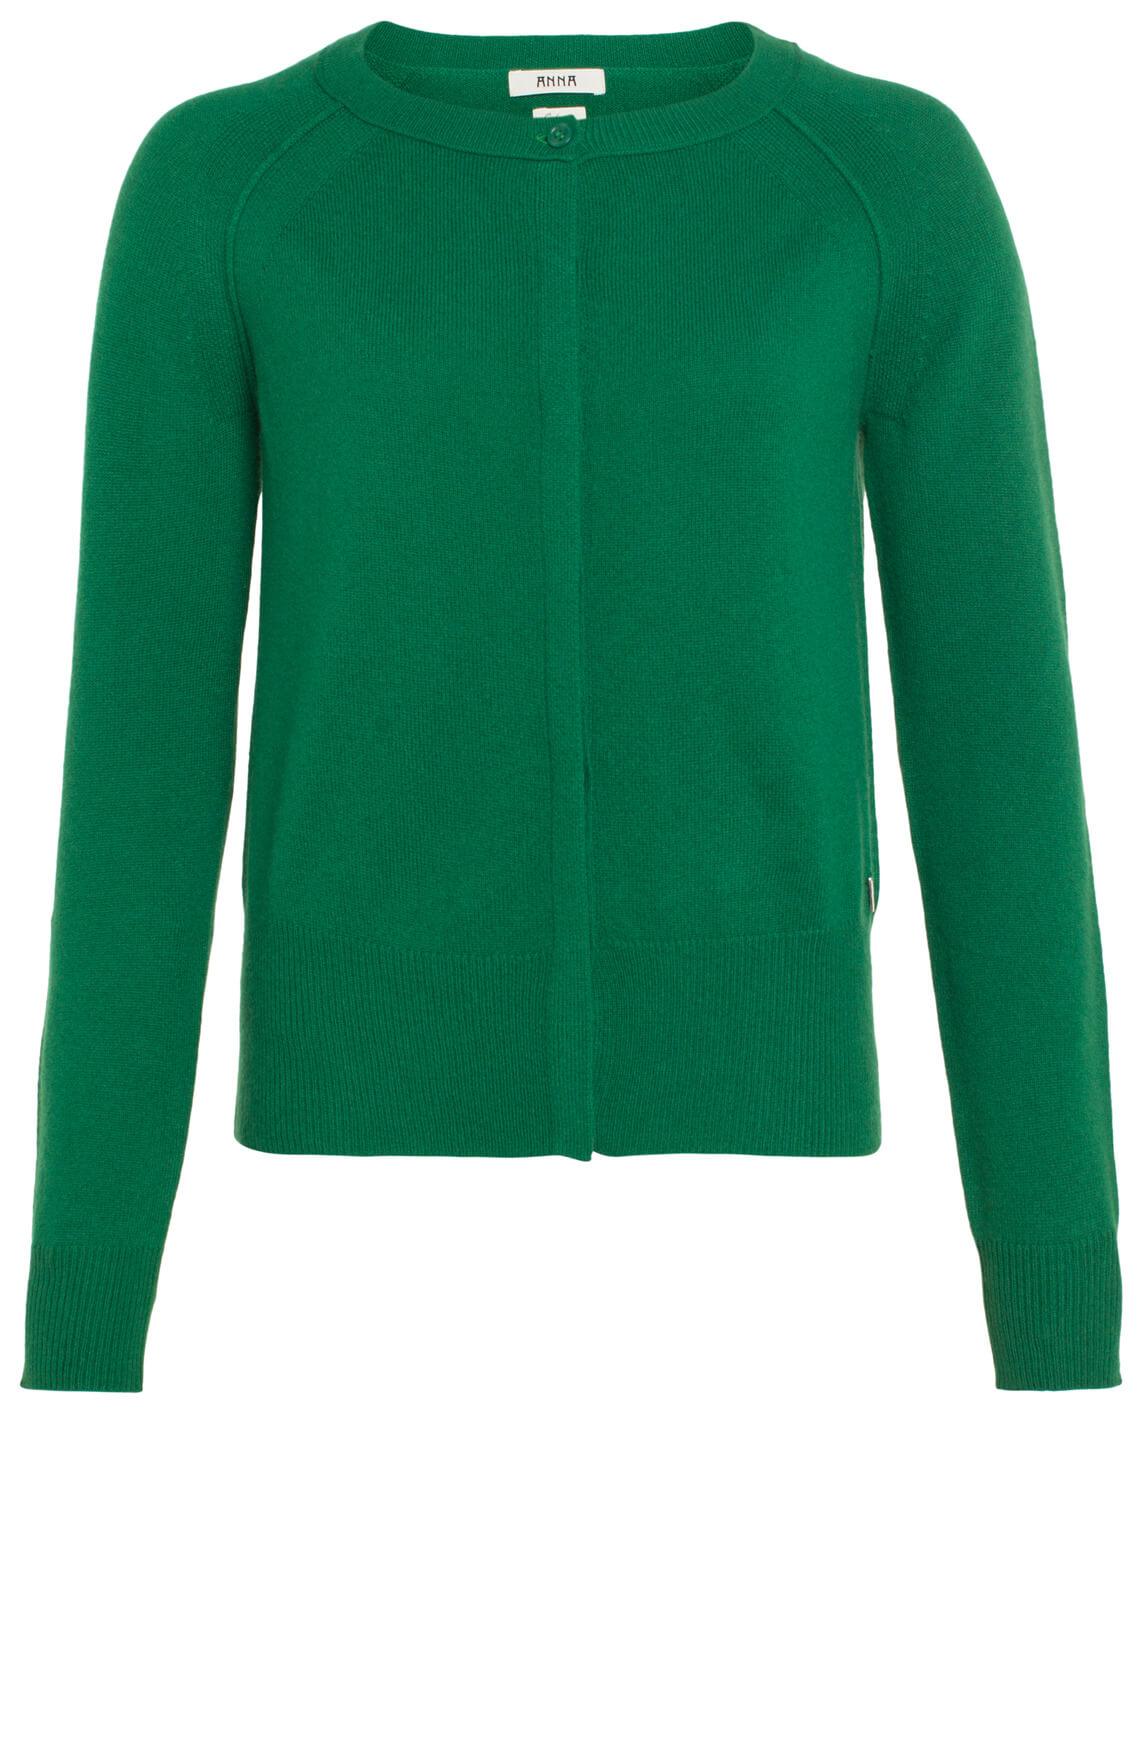 Anna Dames Cashmere vest groen groen